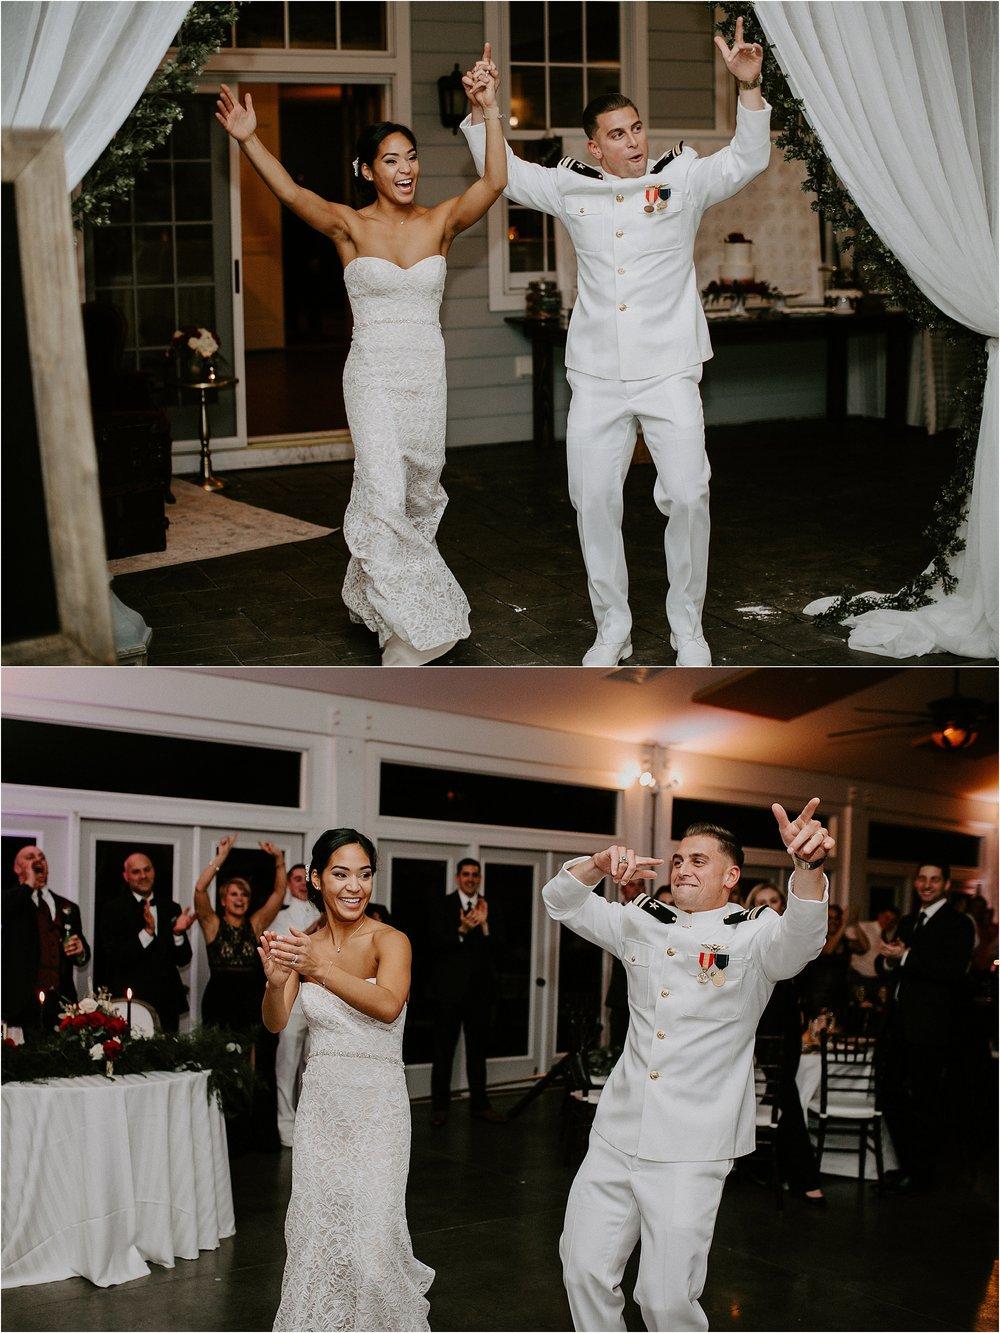 Sarah_Brookhart_Harrisburg_Wedding_Photographer_0049.jpg